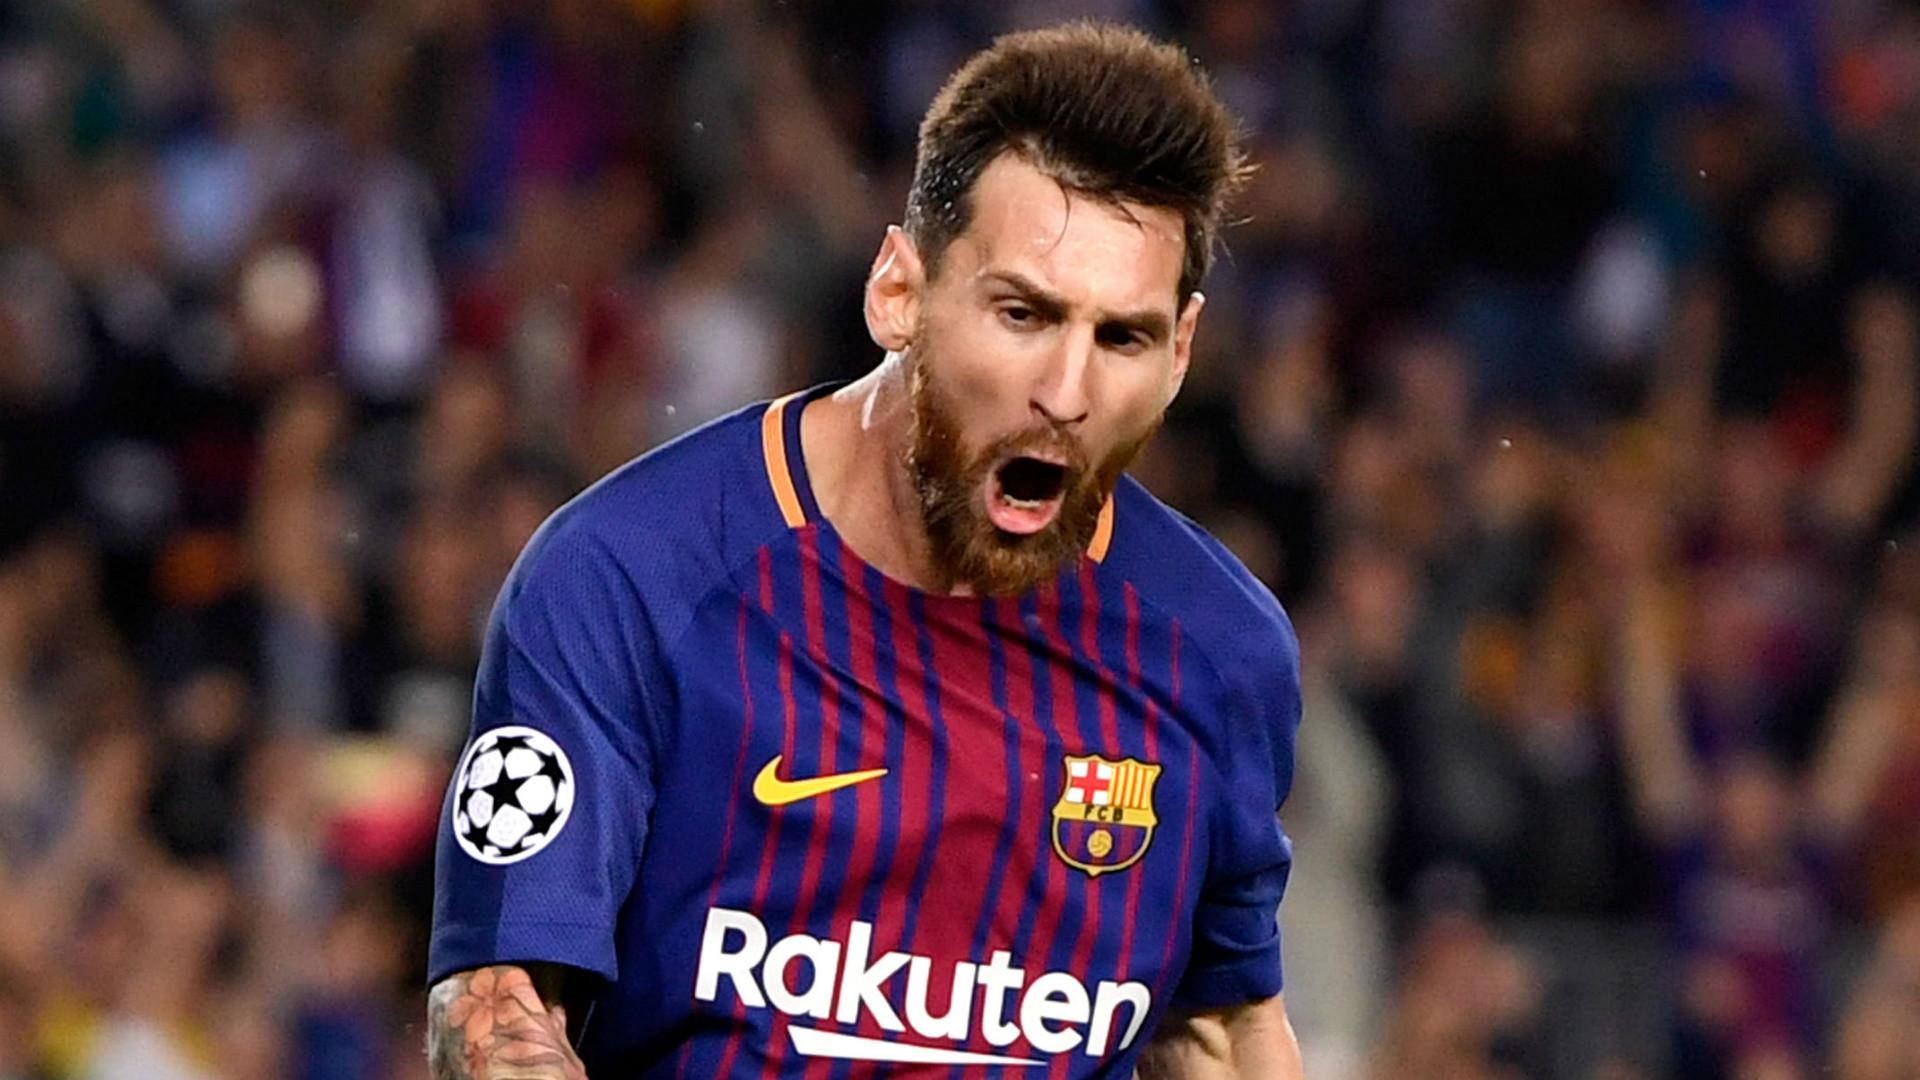 Messi Wallpaper Free Download - impremedia.net